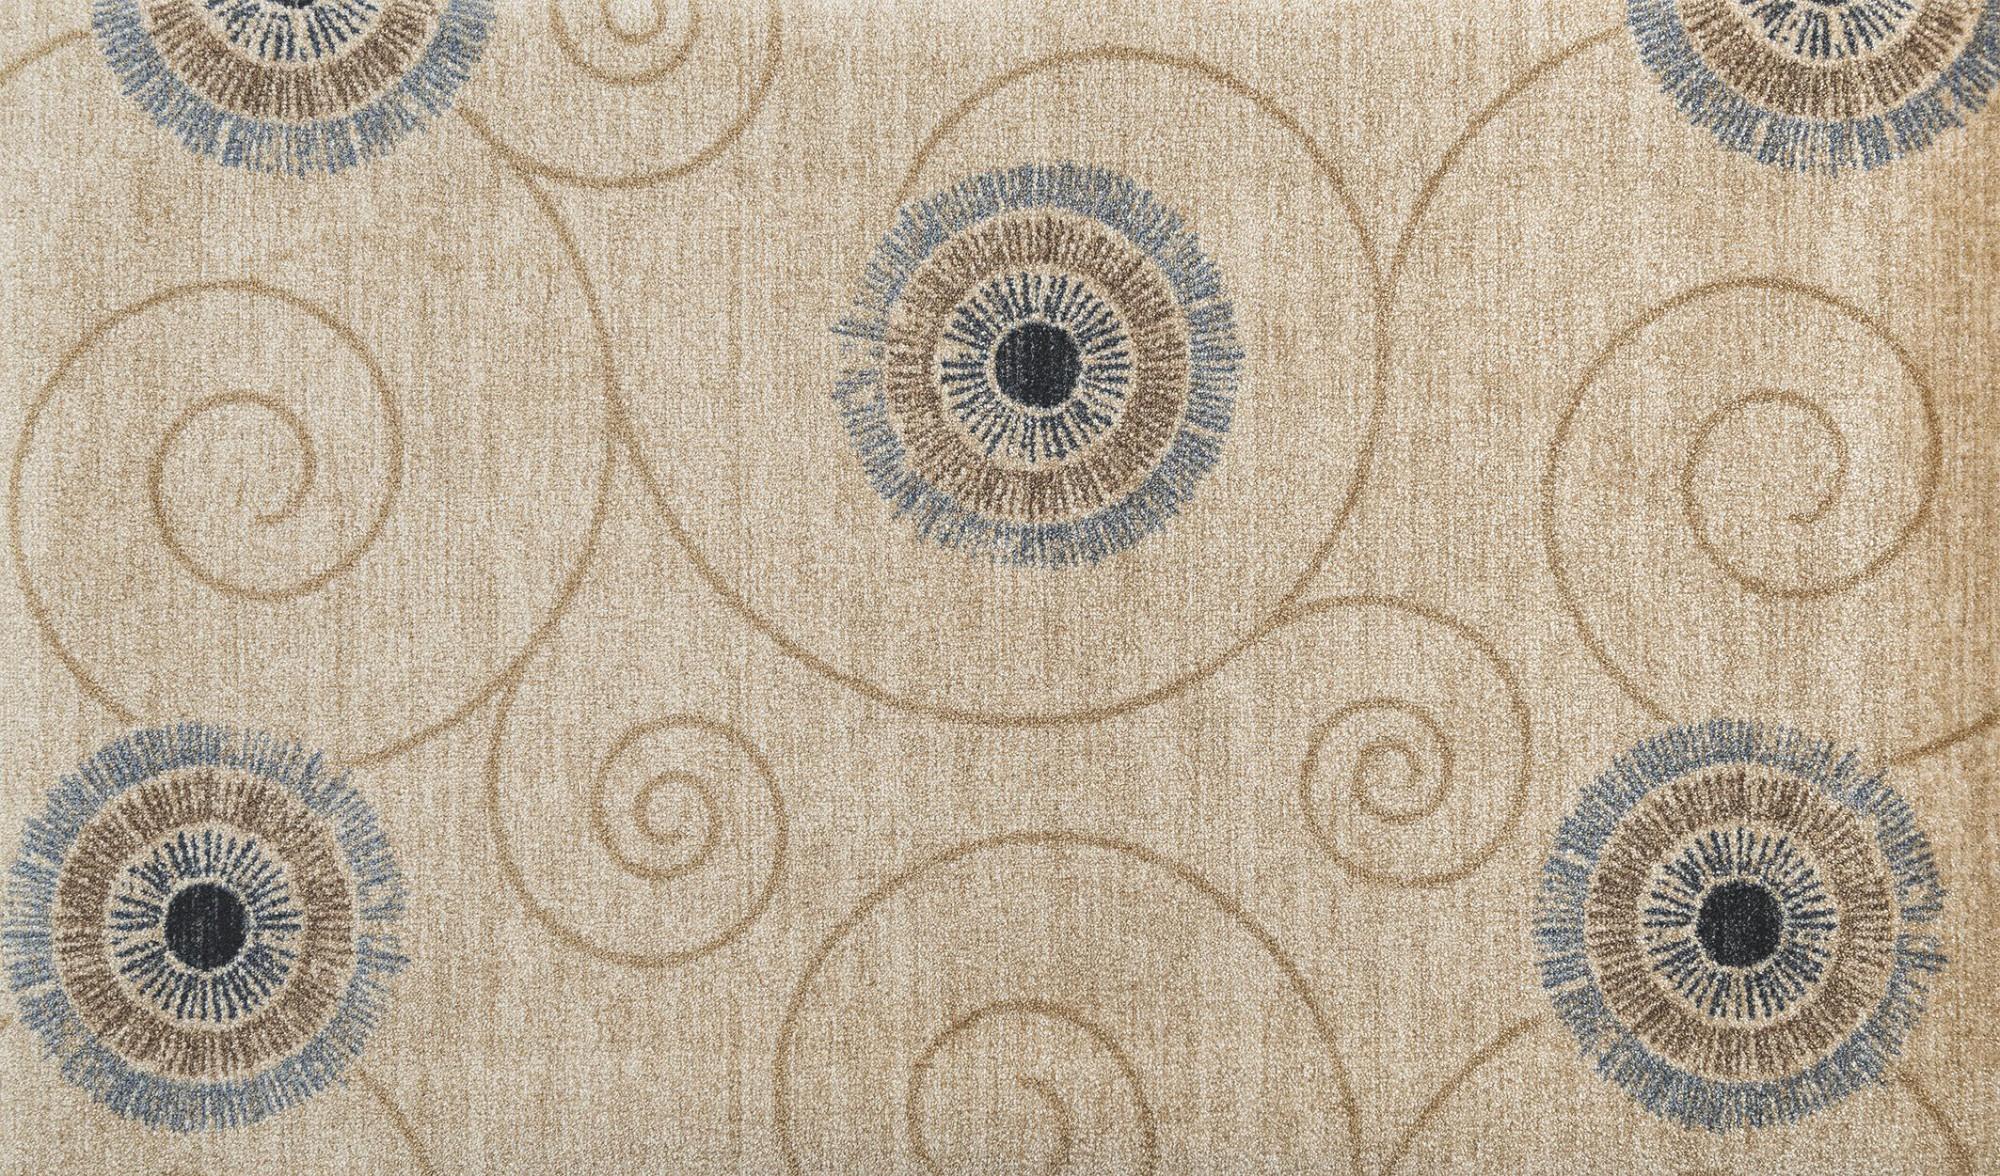 wash dry chiaro waschbarer teppich. Black Bedroom Furniture Sets. Home Design Ideas